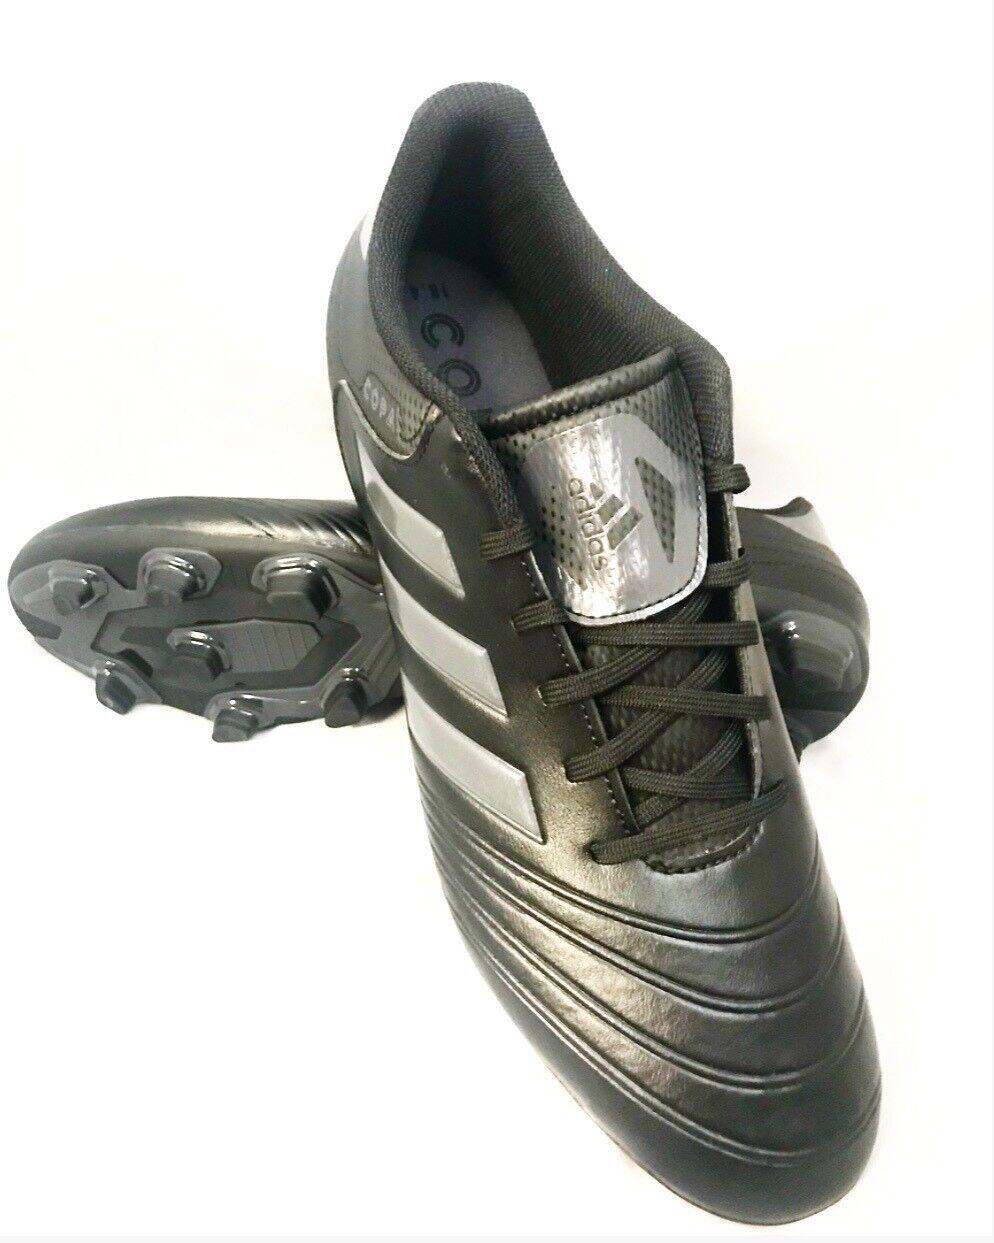 BARGAIN     Adidas Copa 18.4 FXG uomini Footbtutti stivali CP8961